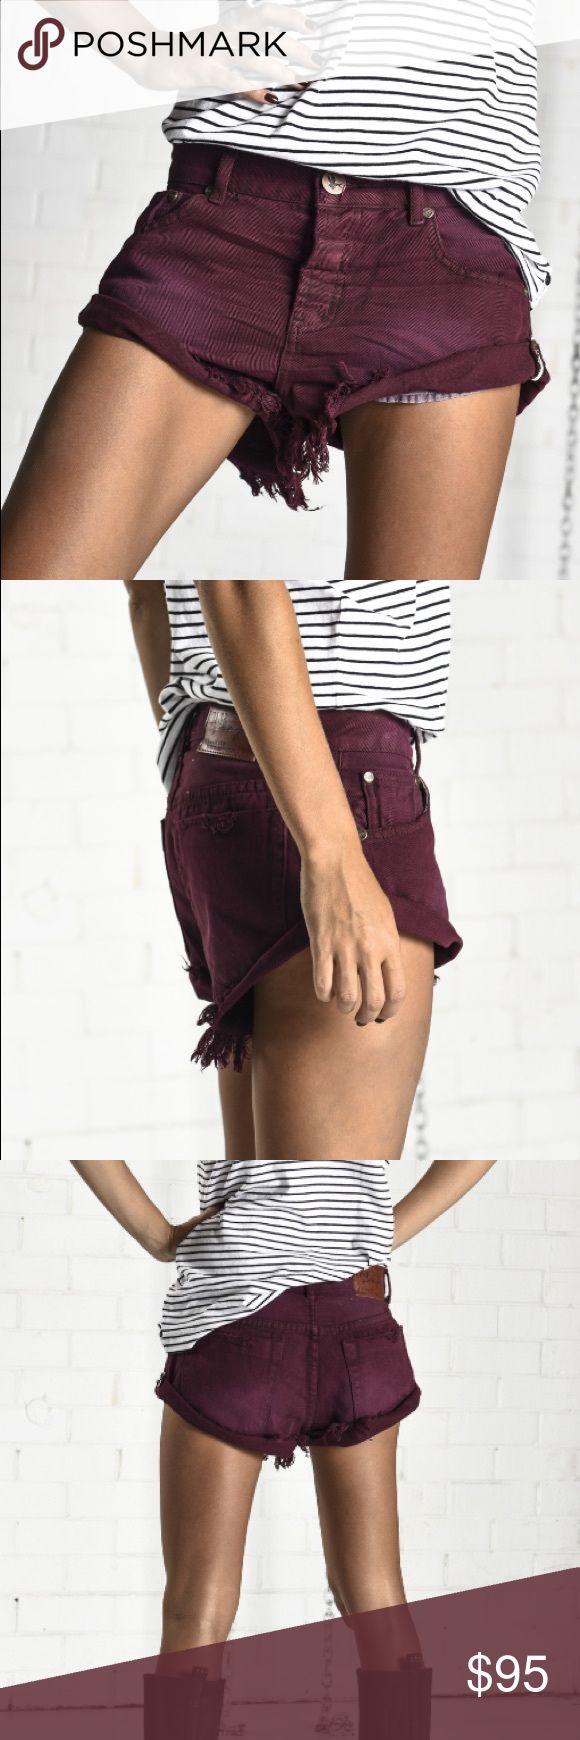 NWT💠 One Teaspoon Bordeaux Bandits Shredded denim One Teaspoon cutoffs with a slouchy, high-cut silhouette. 5-pocket styling. Button fly.  Fabric: Denim. Wash cold.   Measurements Rise: 9.75in / 25cm Inseam: 2in / 5cm One Teaspoon Shorts Jean Shorts